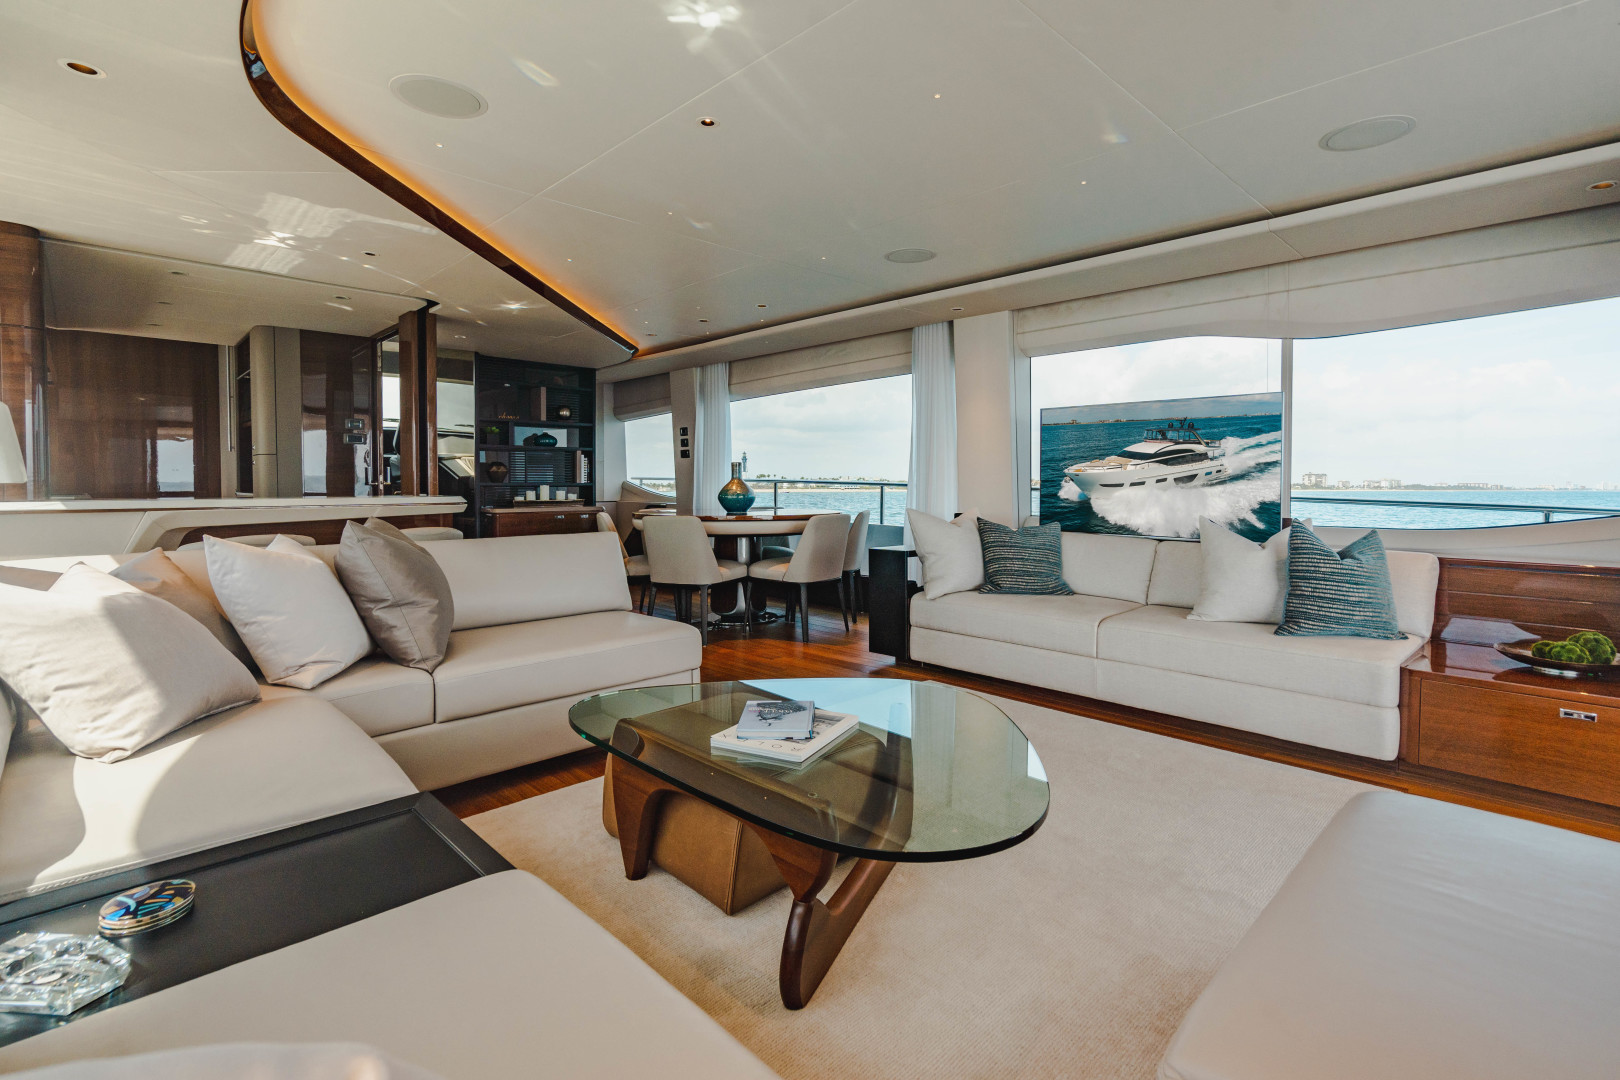 Princess-Y85  2019-Splash Delray Beach-Florida-United States-1631651 | Thumbnail